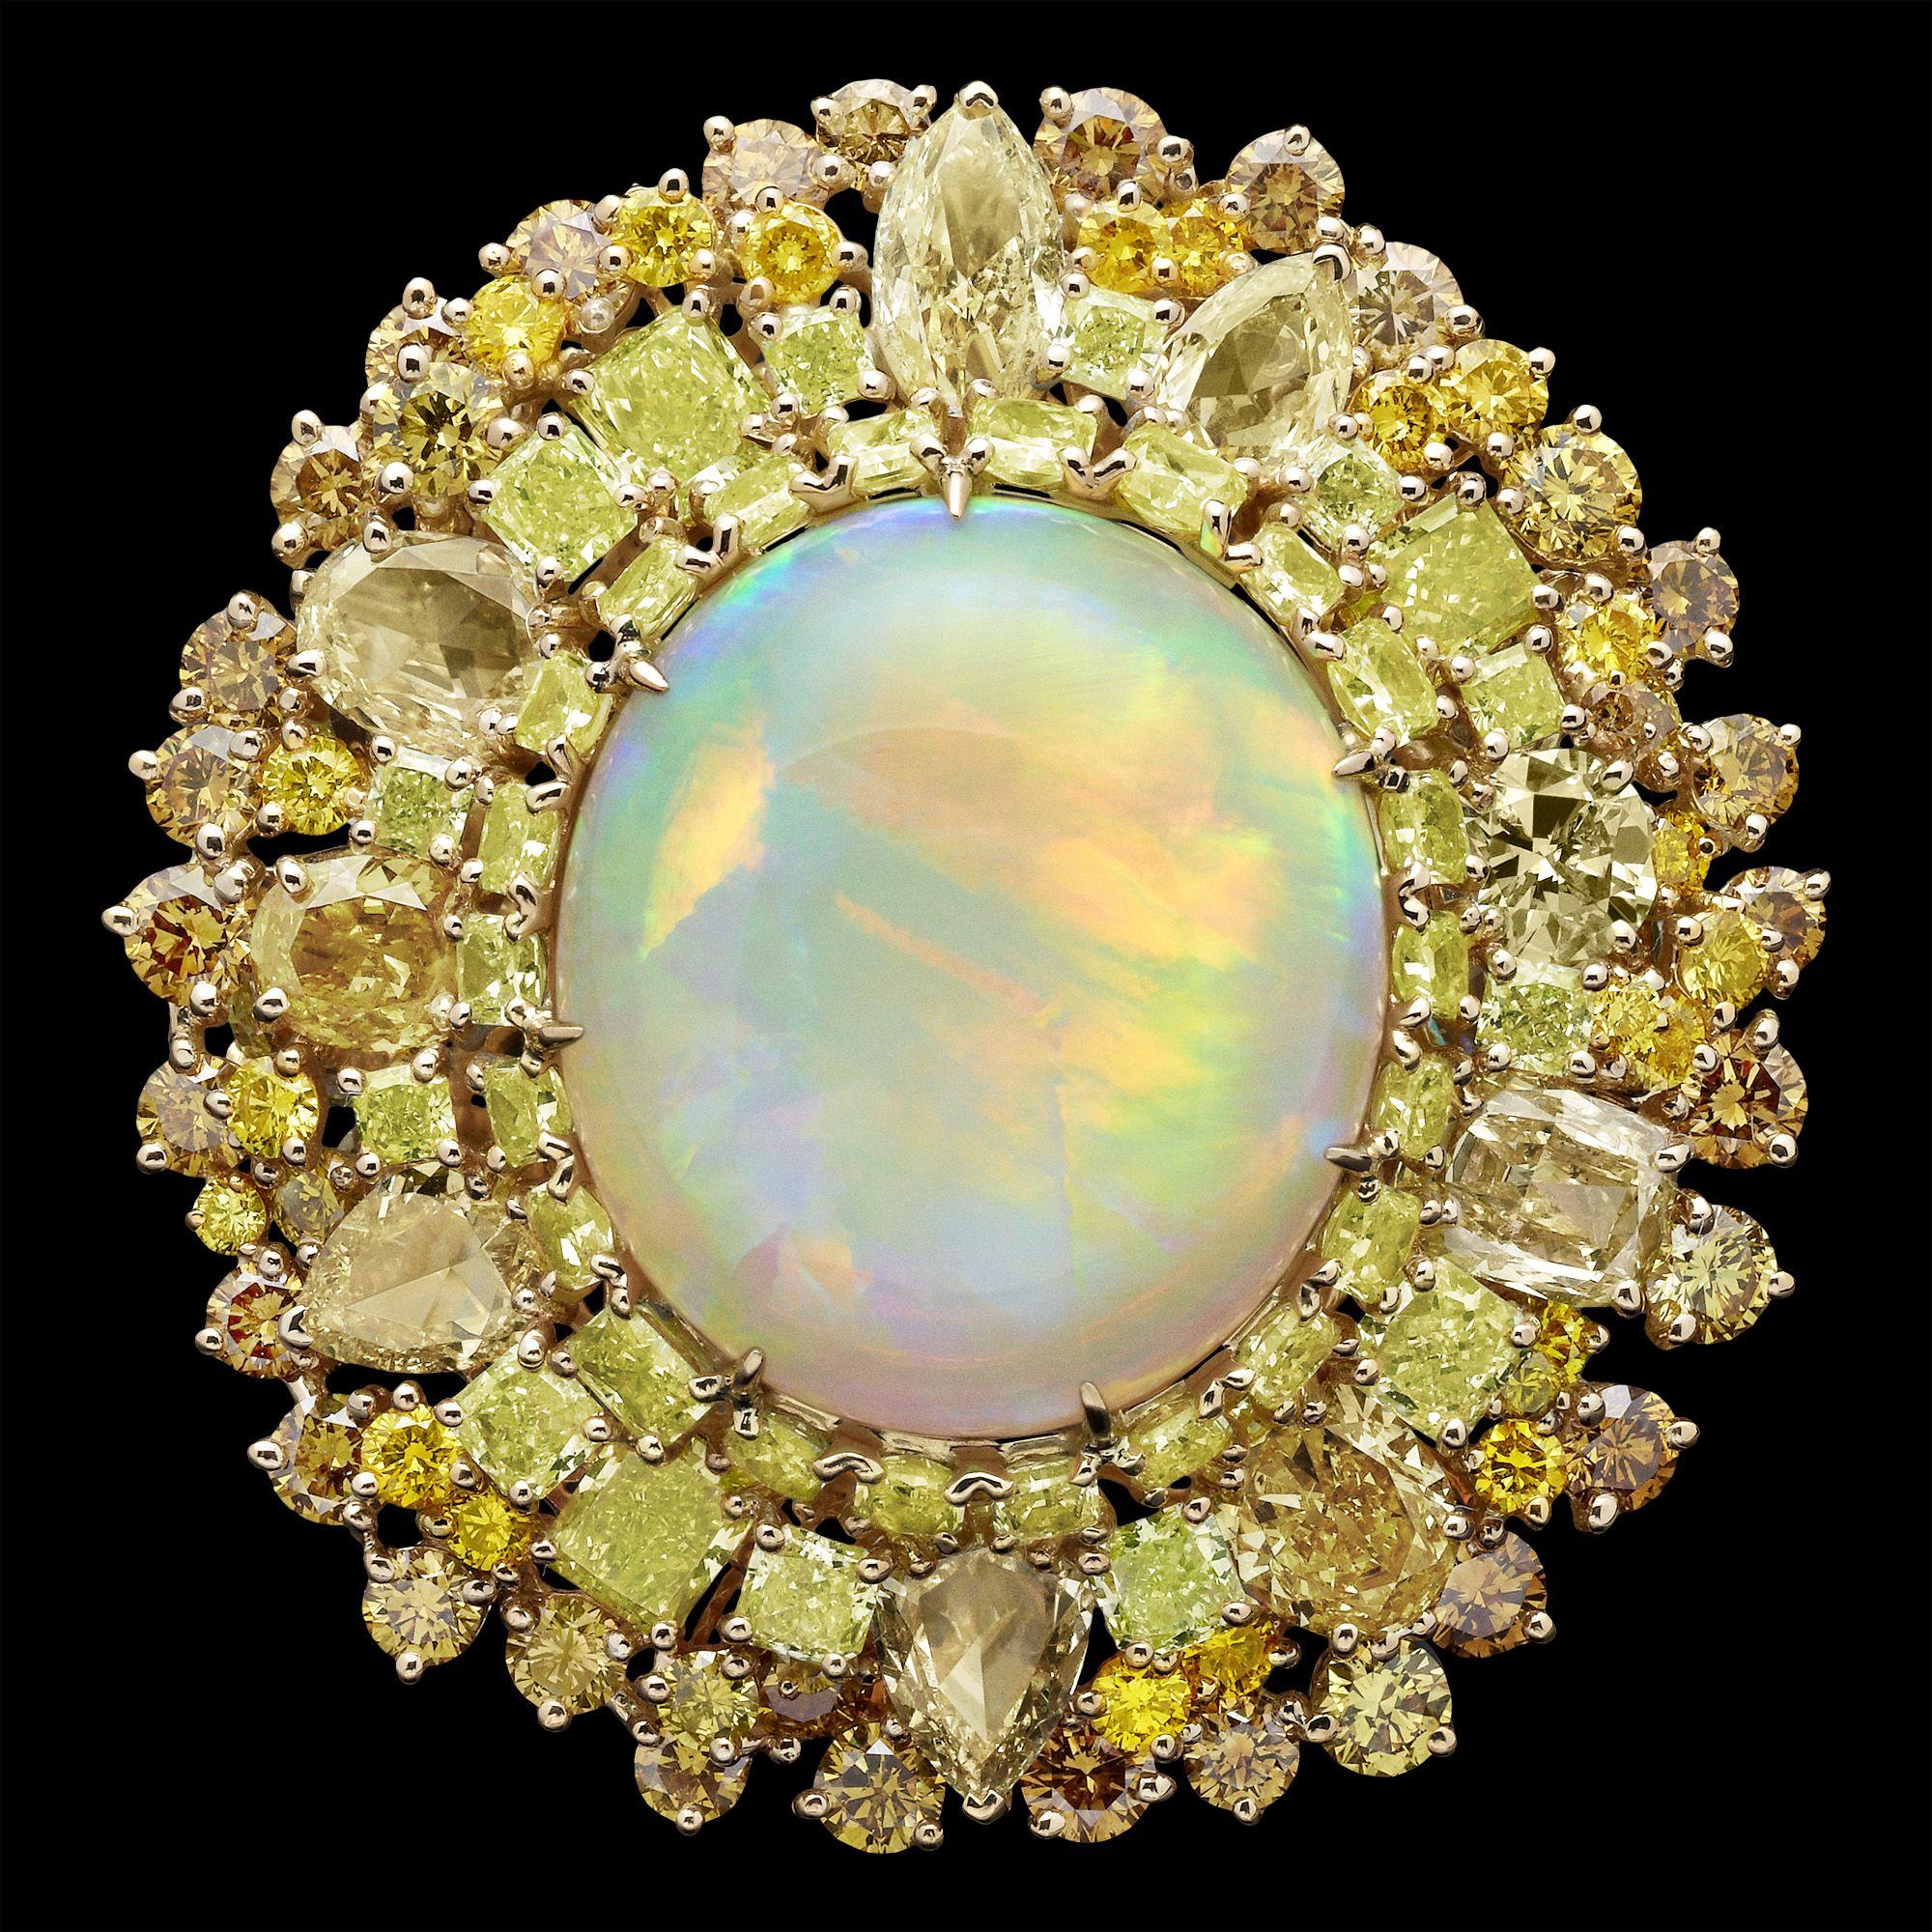 Dior Jewellery – Dear Dior: 'Dentelle Médaillon Soleil' ring. Discover more on www.dior.com